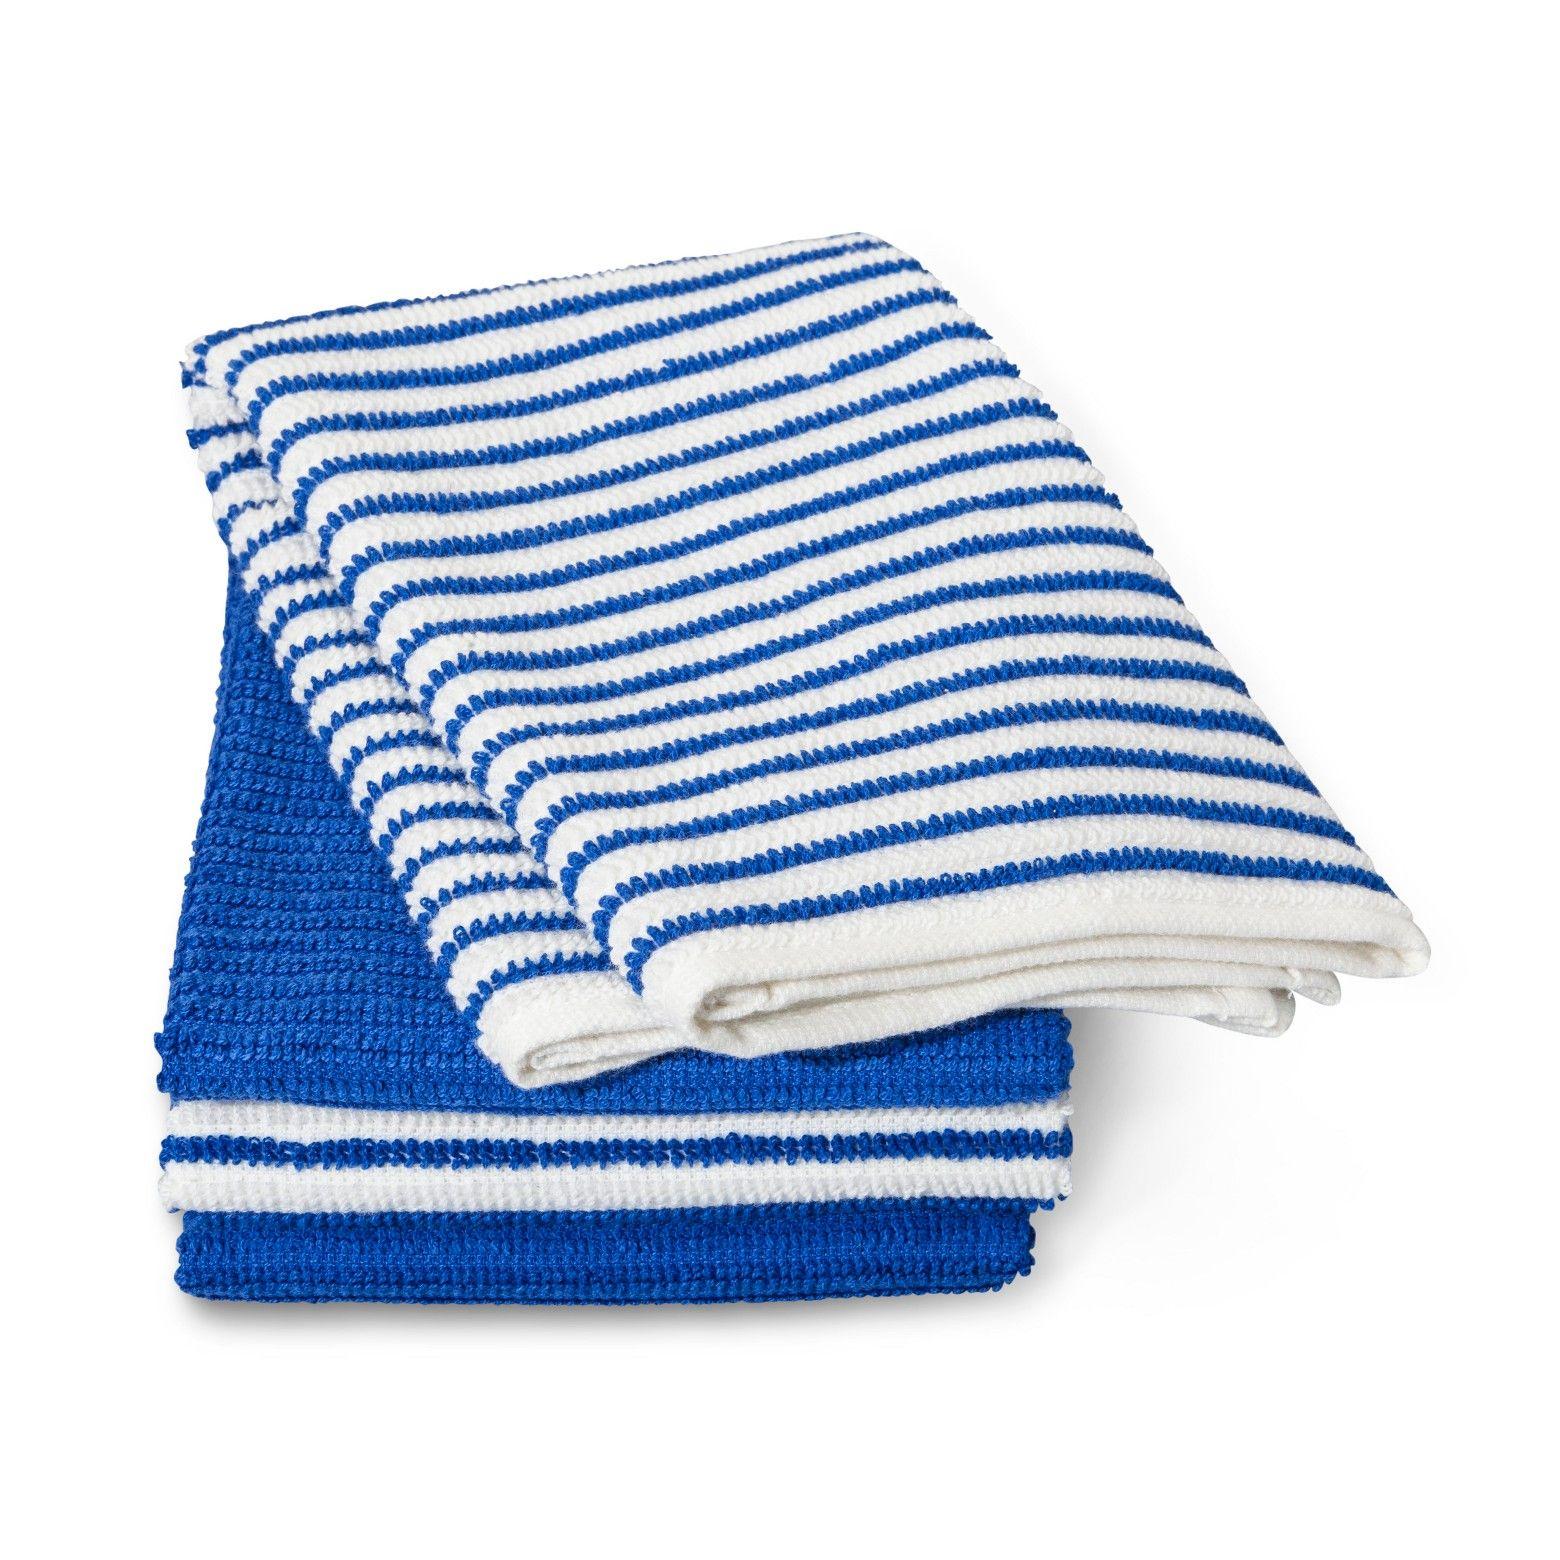 6pk blue kitchen towel - room essentials, glorious blue